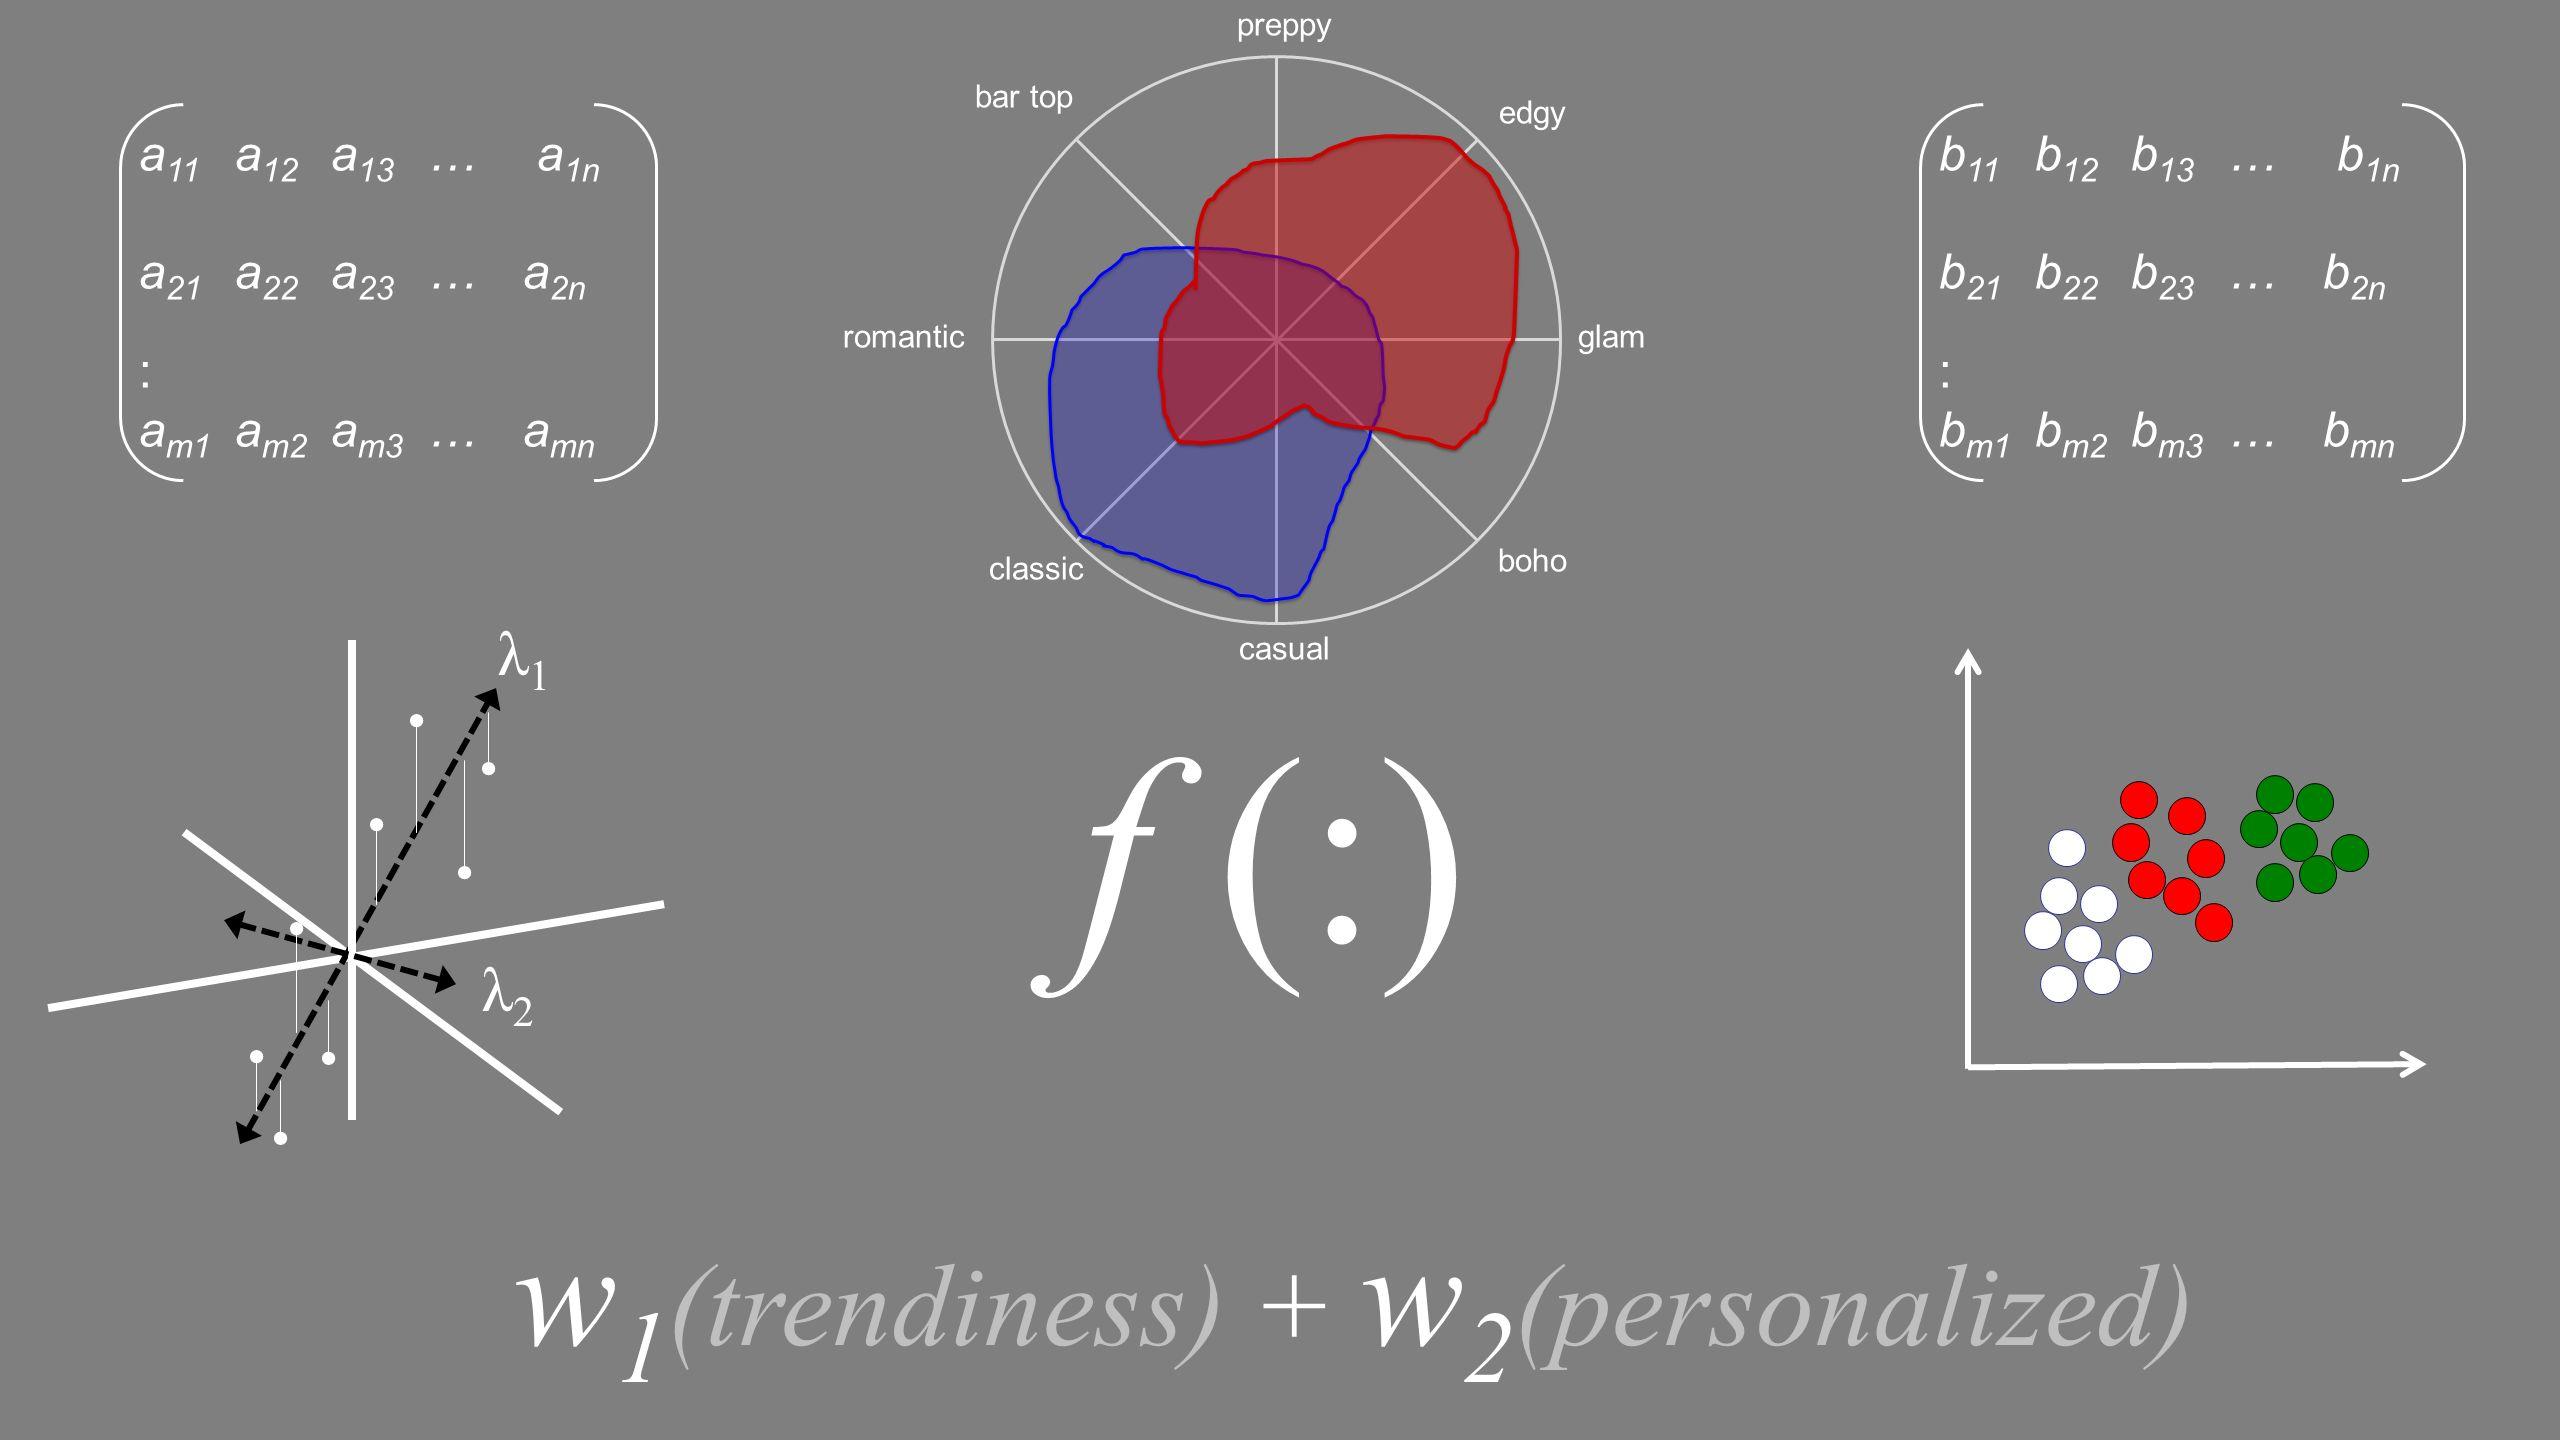 f (:) w1(trendiness) + w2(personalized) λ1 λ2 a11 a12 a13 … a1n